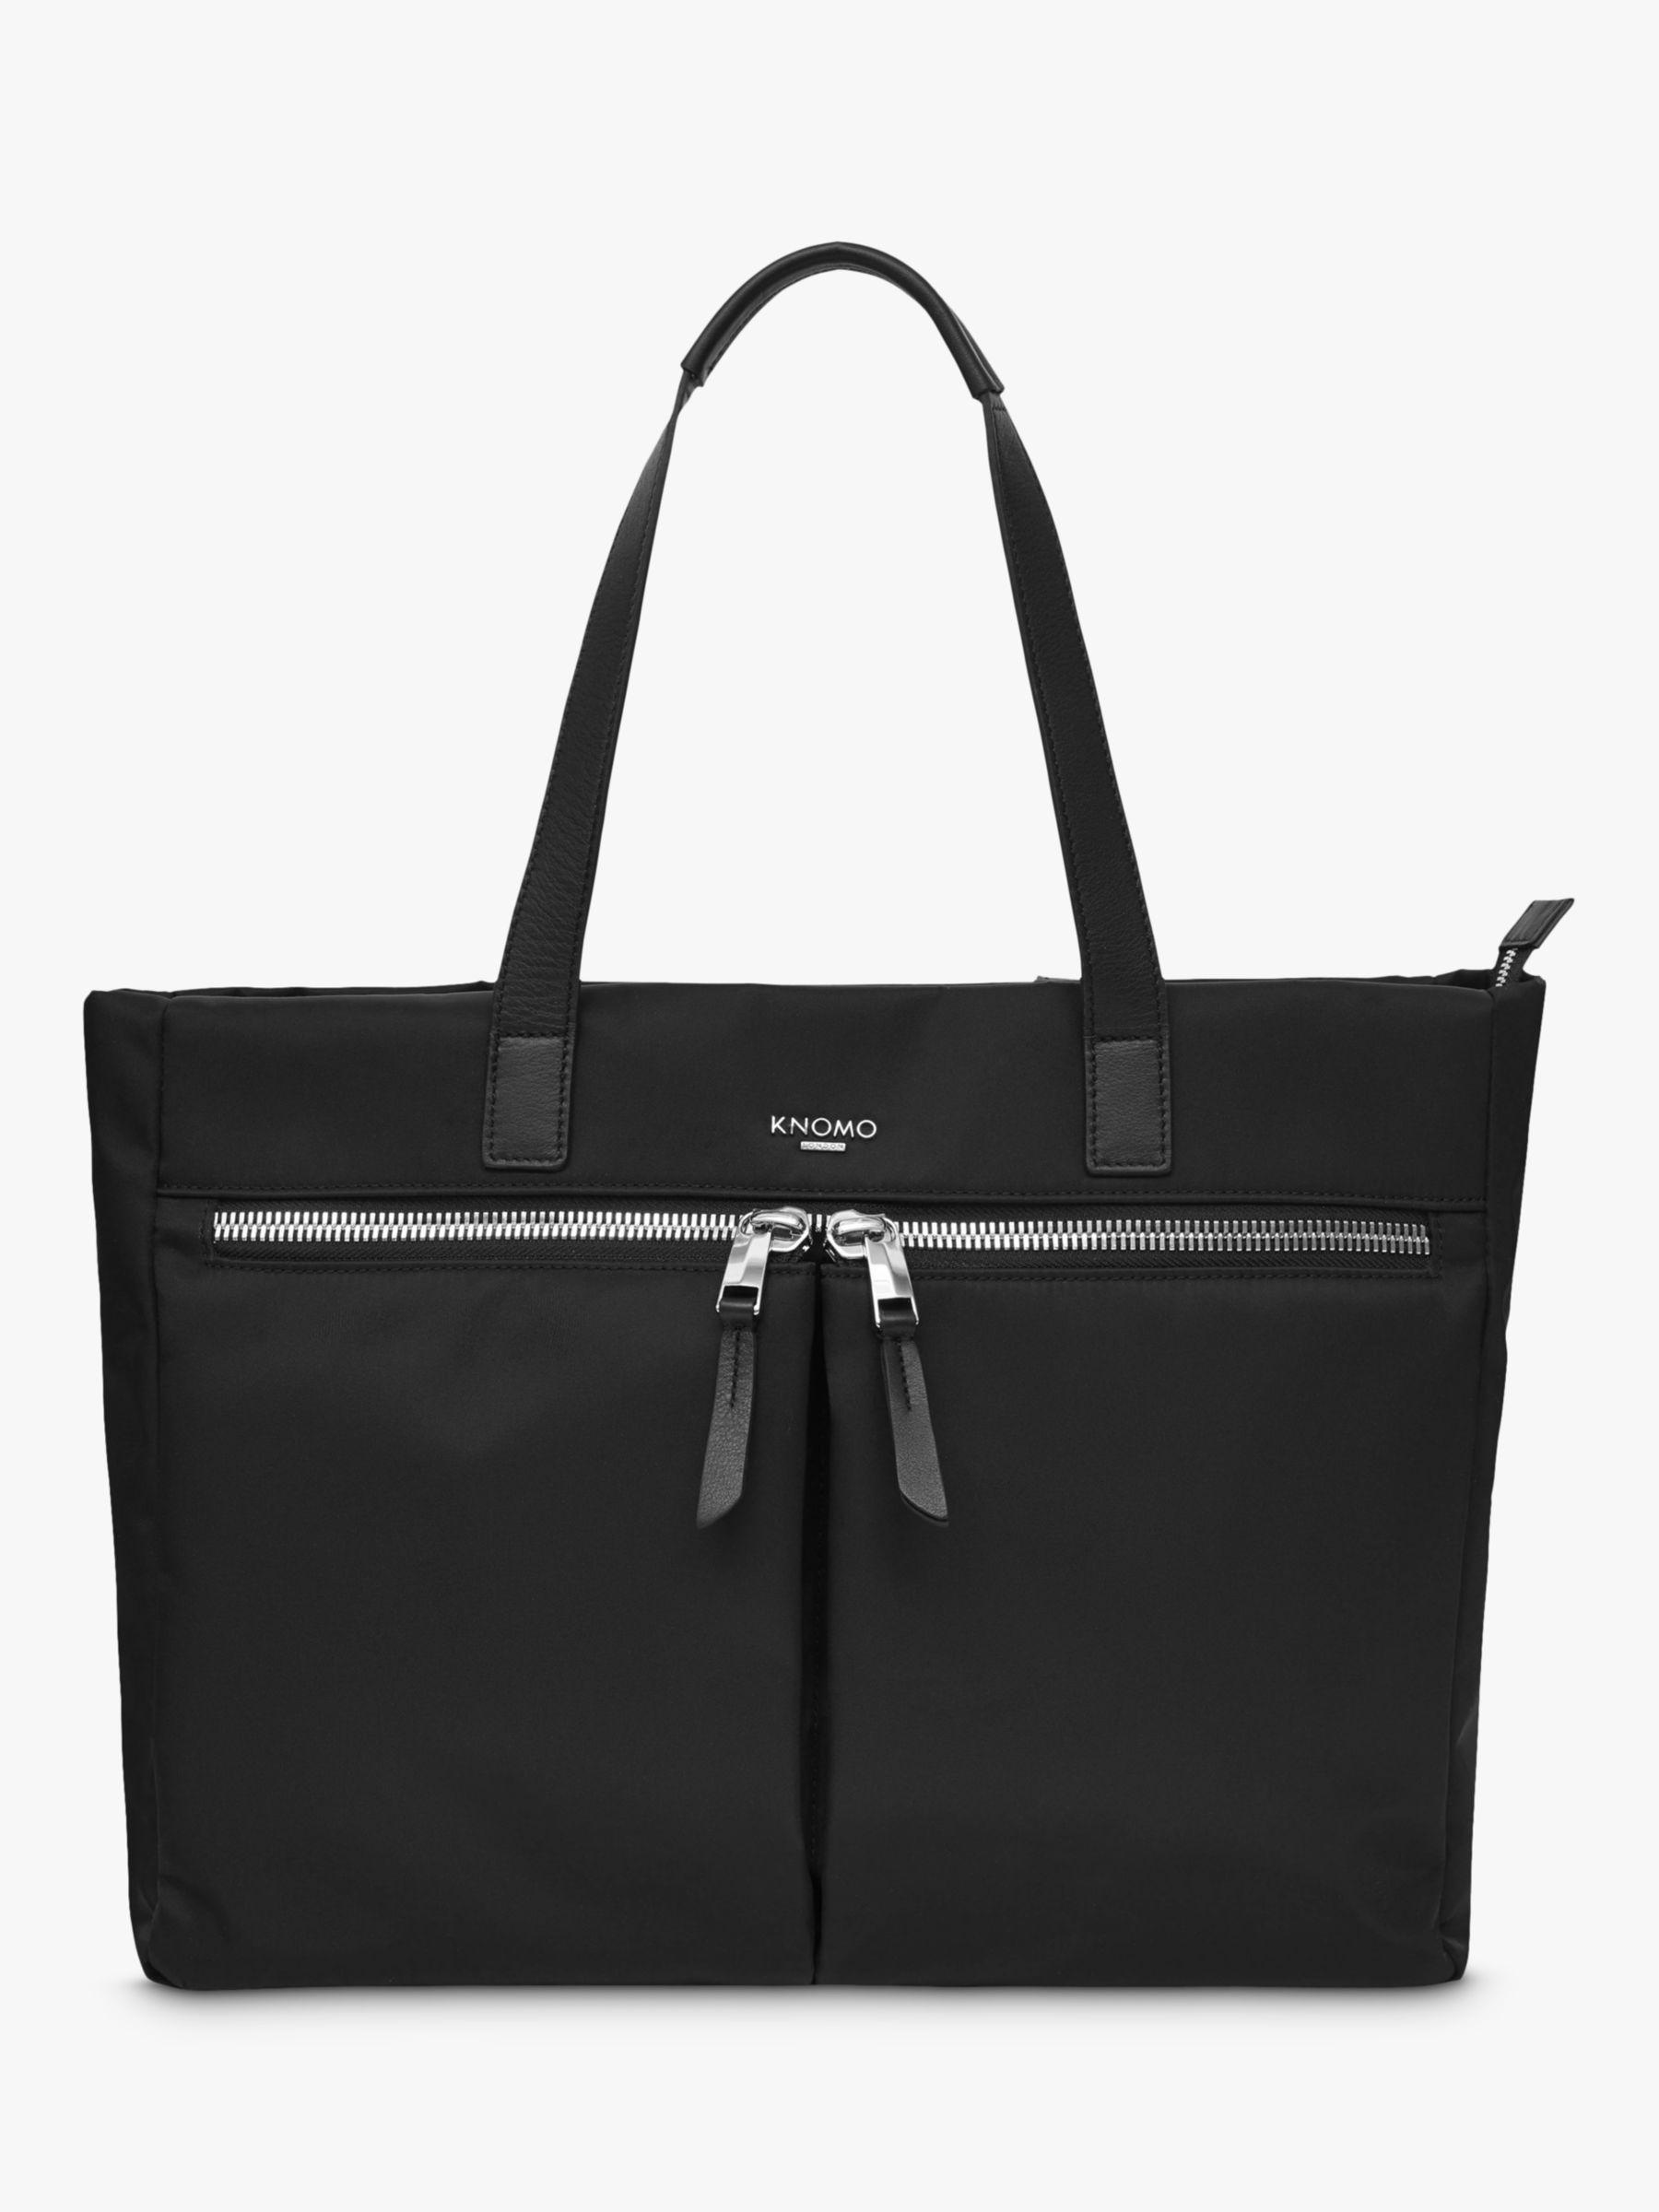 Knomo KNOMO Blenheim Tote Bag for Laptops up to 14, Black